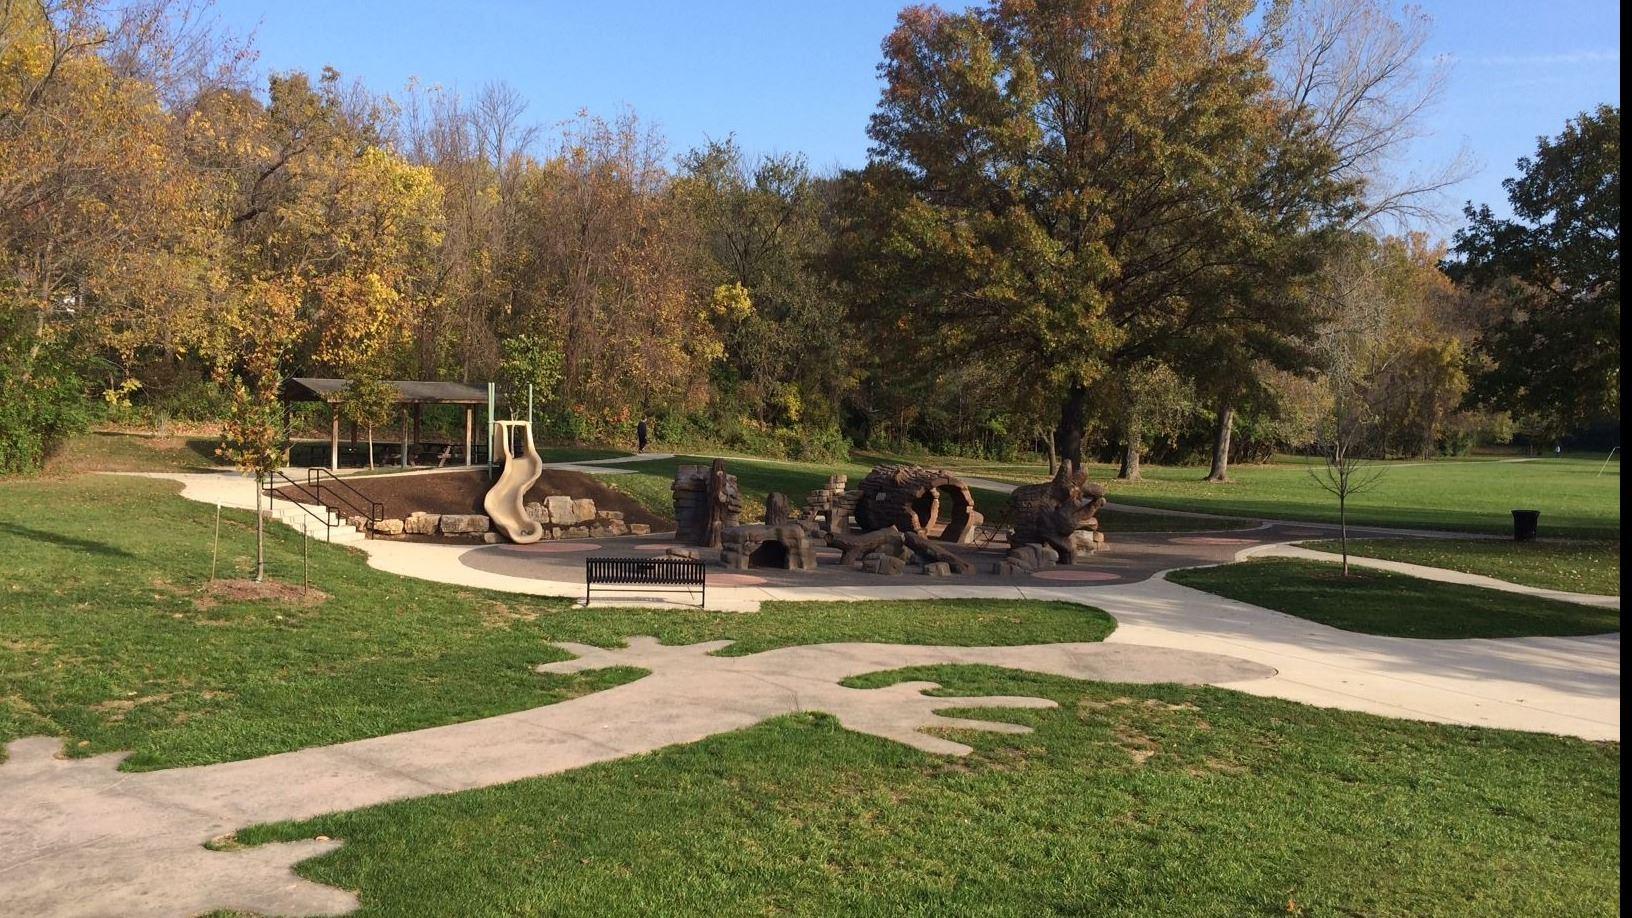 City Parks | Des Peres, MO - Official Website